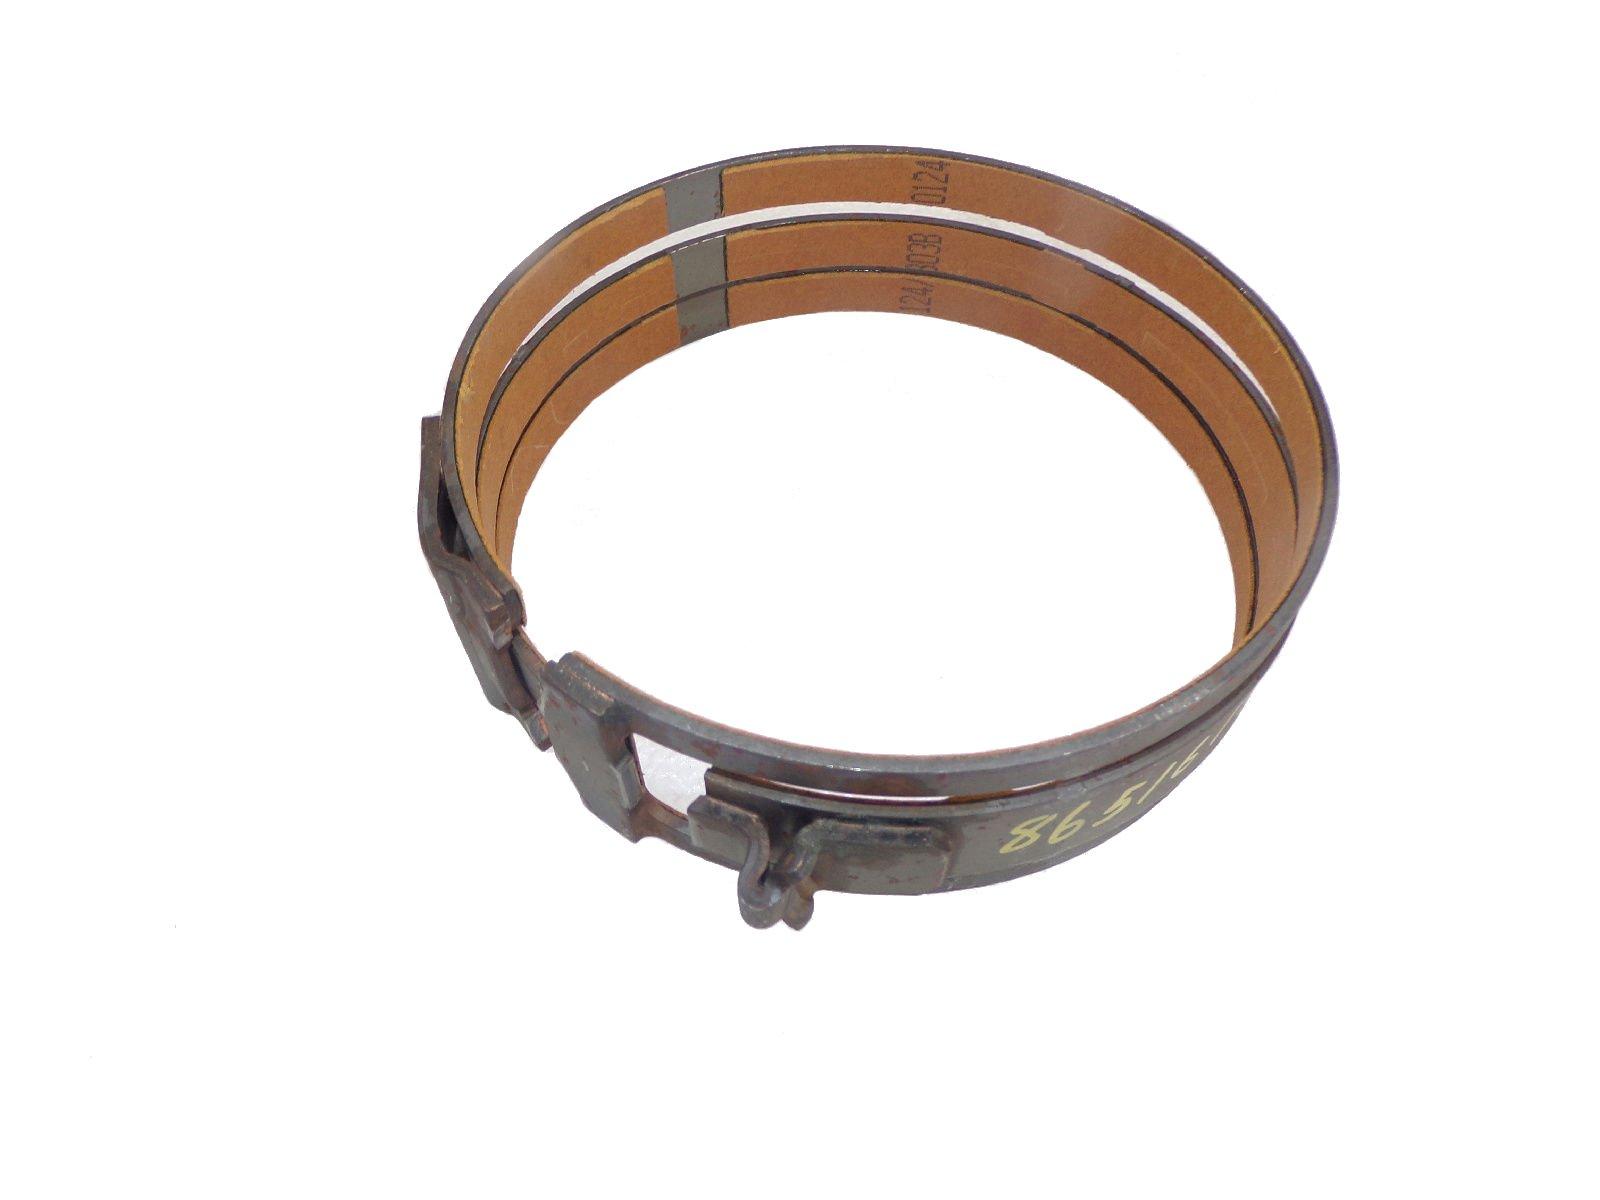 ACDelco 8651614 Automatic Transmission Band (Borg Warner, 4T60E/4T65E:Foward (Rear) / 4T40/45E: Low/Reverse)